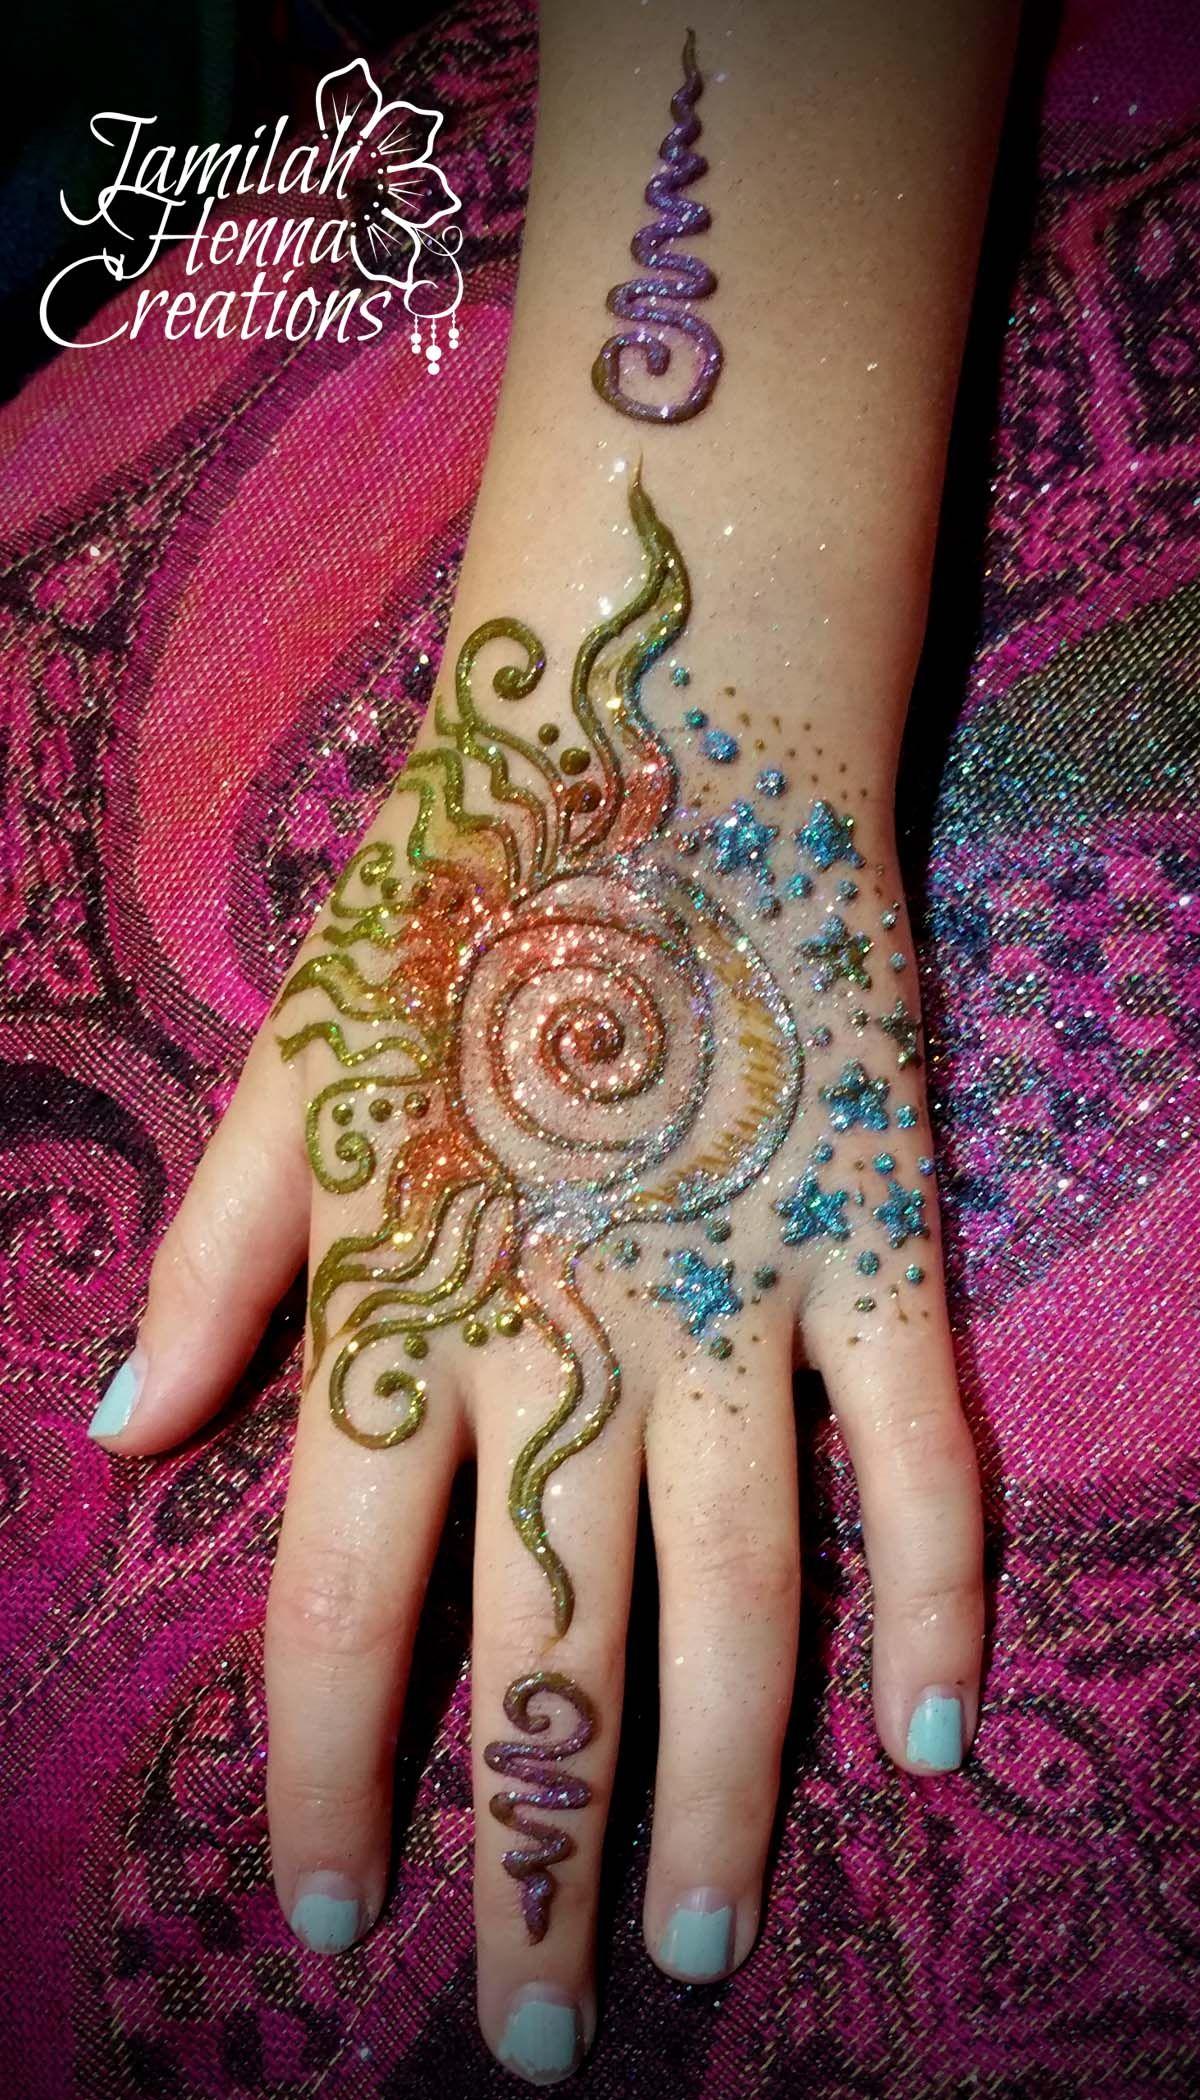 Sun Moon Glitter Henna Www Jamilahhennacreations Com Henna Henna